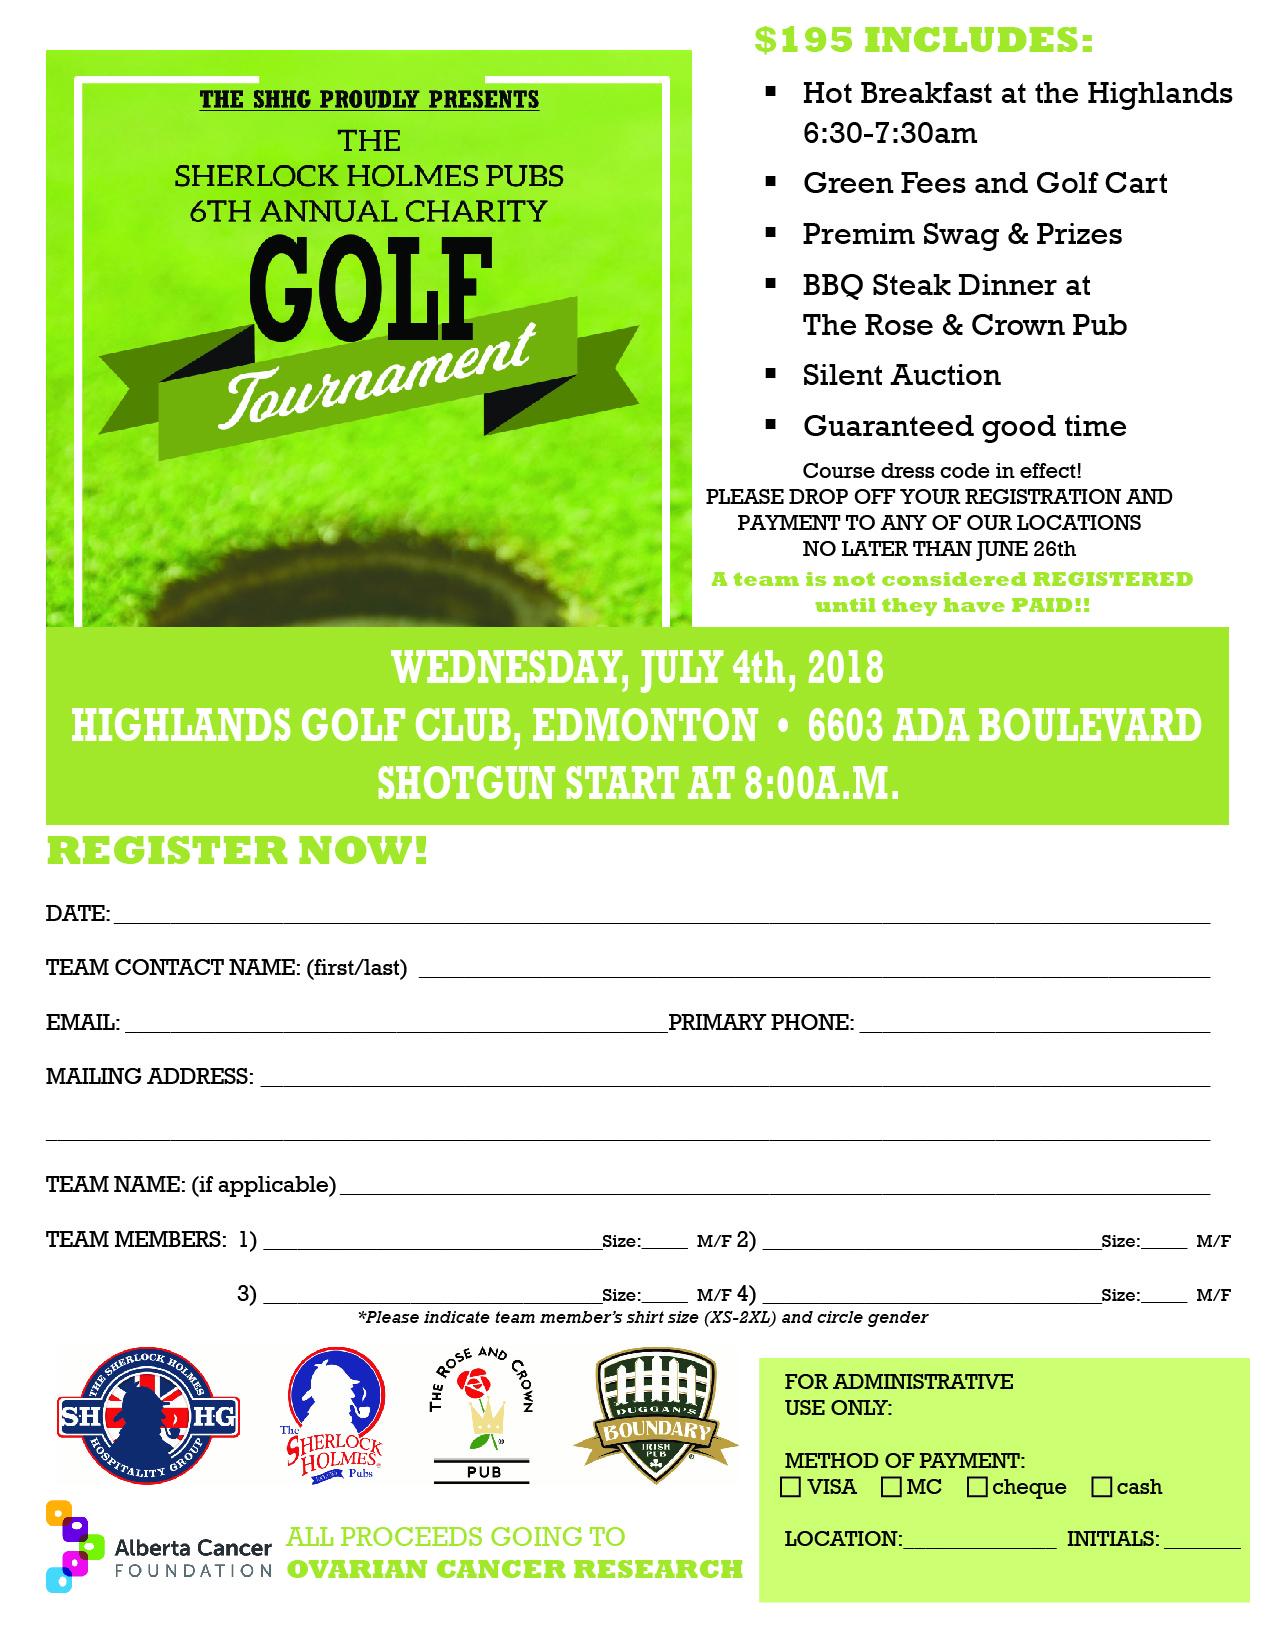 2018 SHHG Charity Golf Tournament Registration Form.jpg